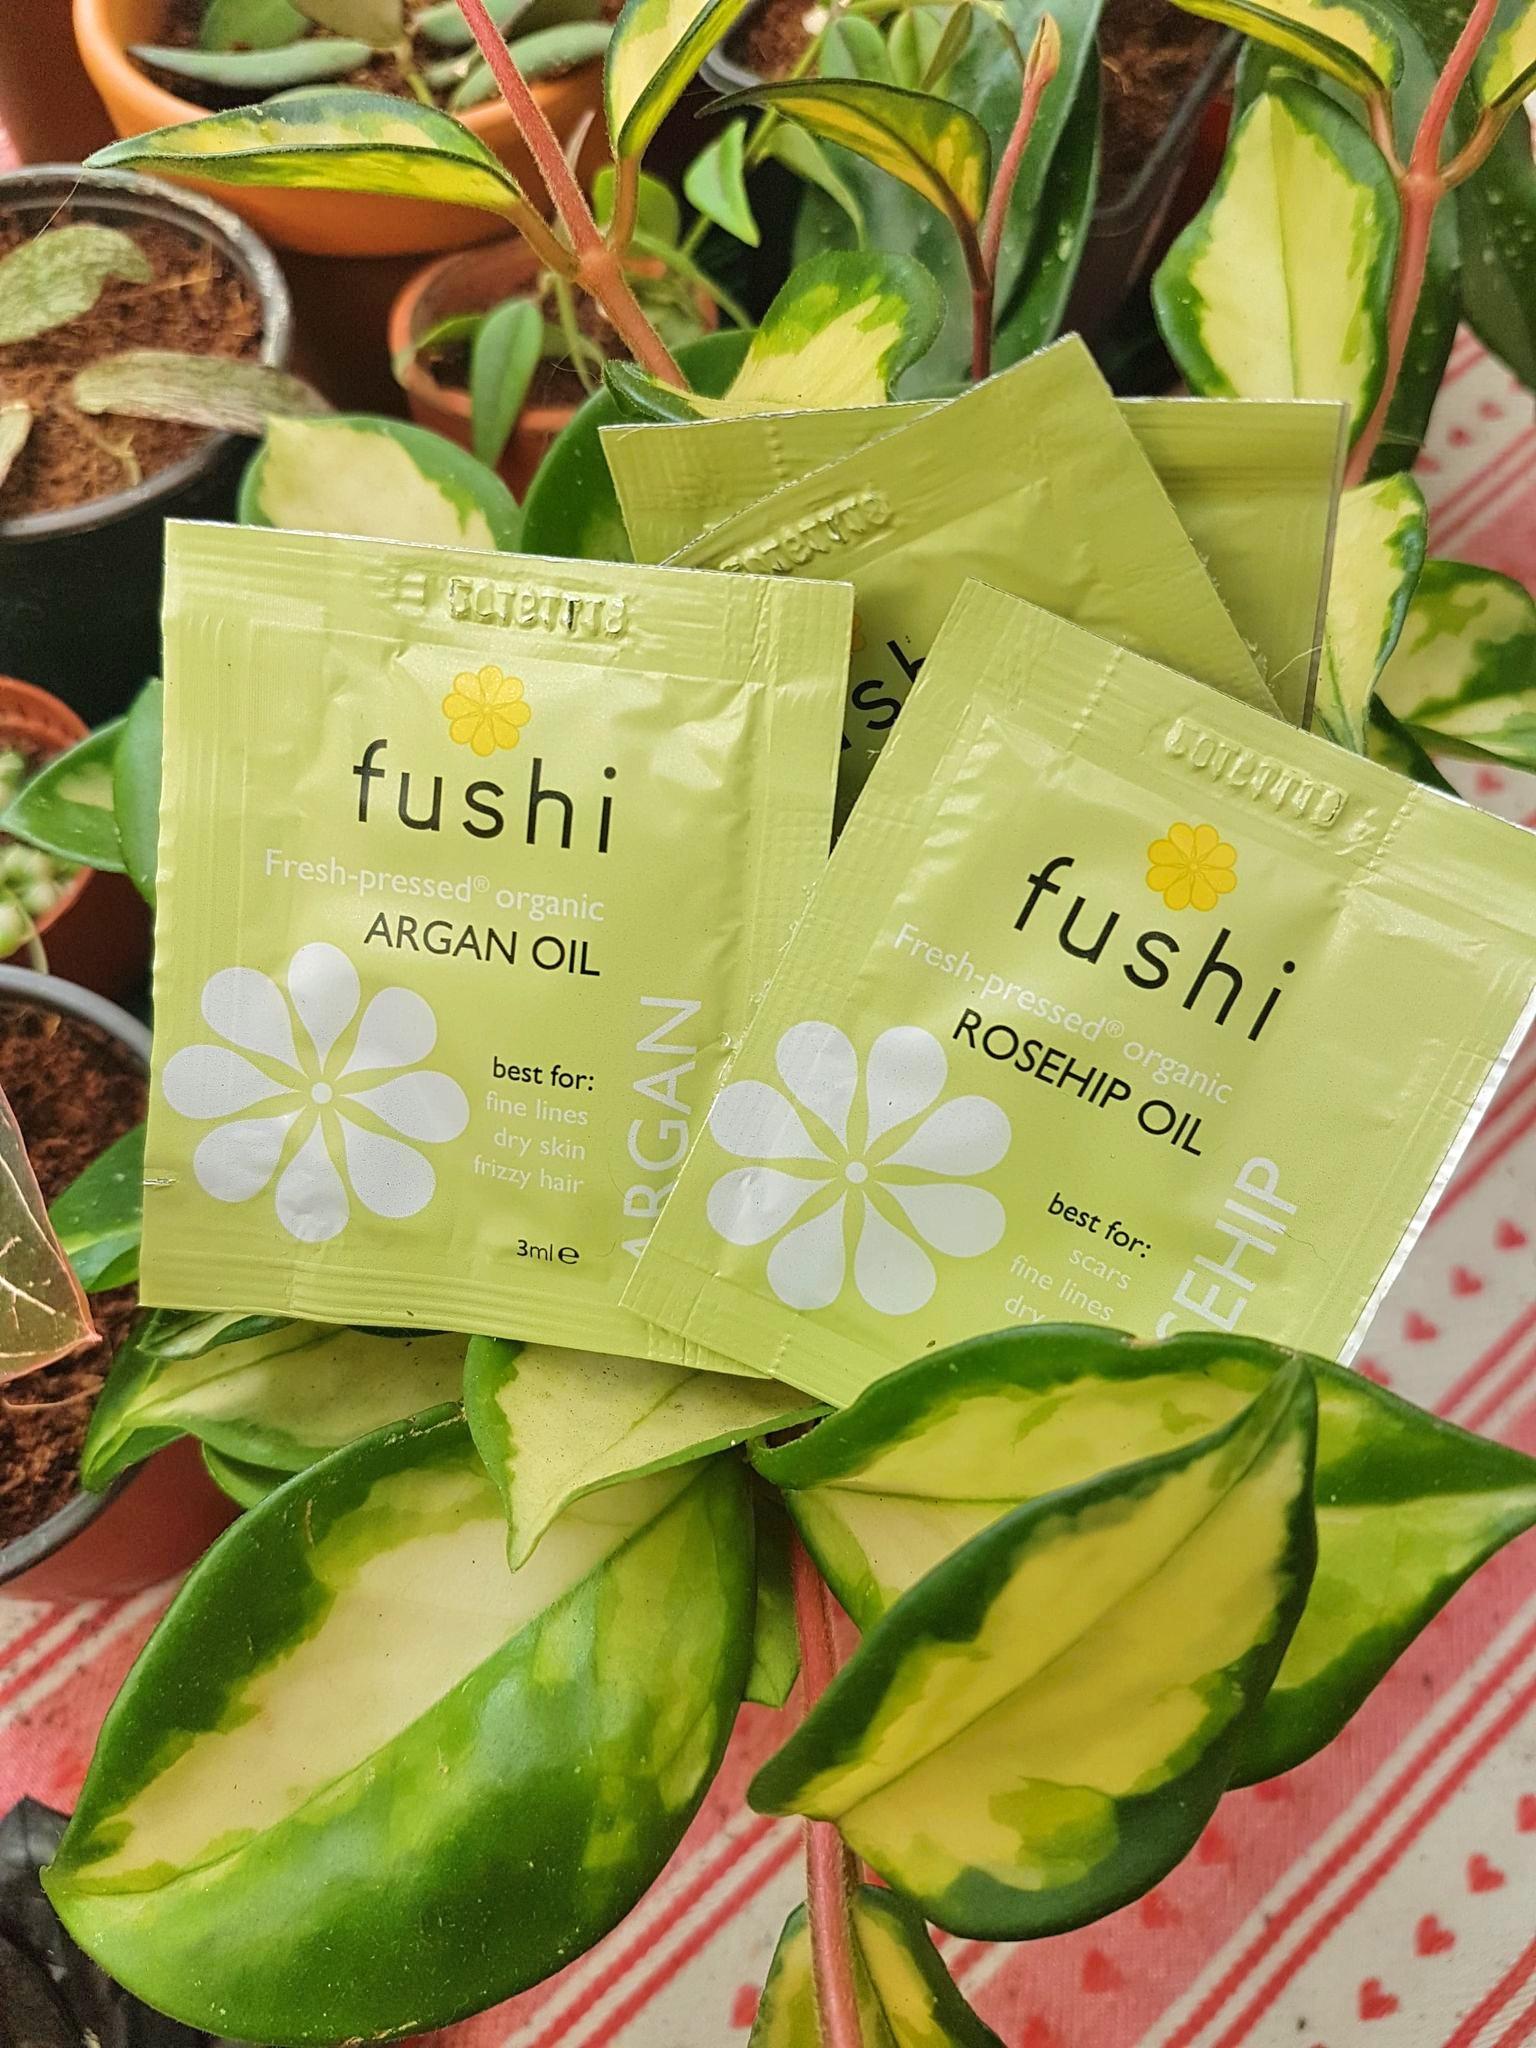 Fushi rosehip and argan oil plastic sample sachets sitting on a hoya plant